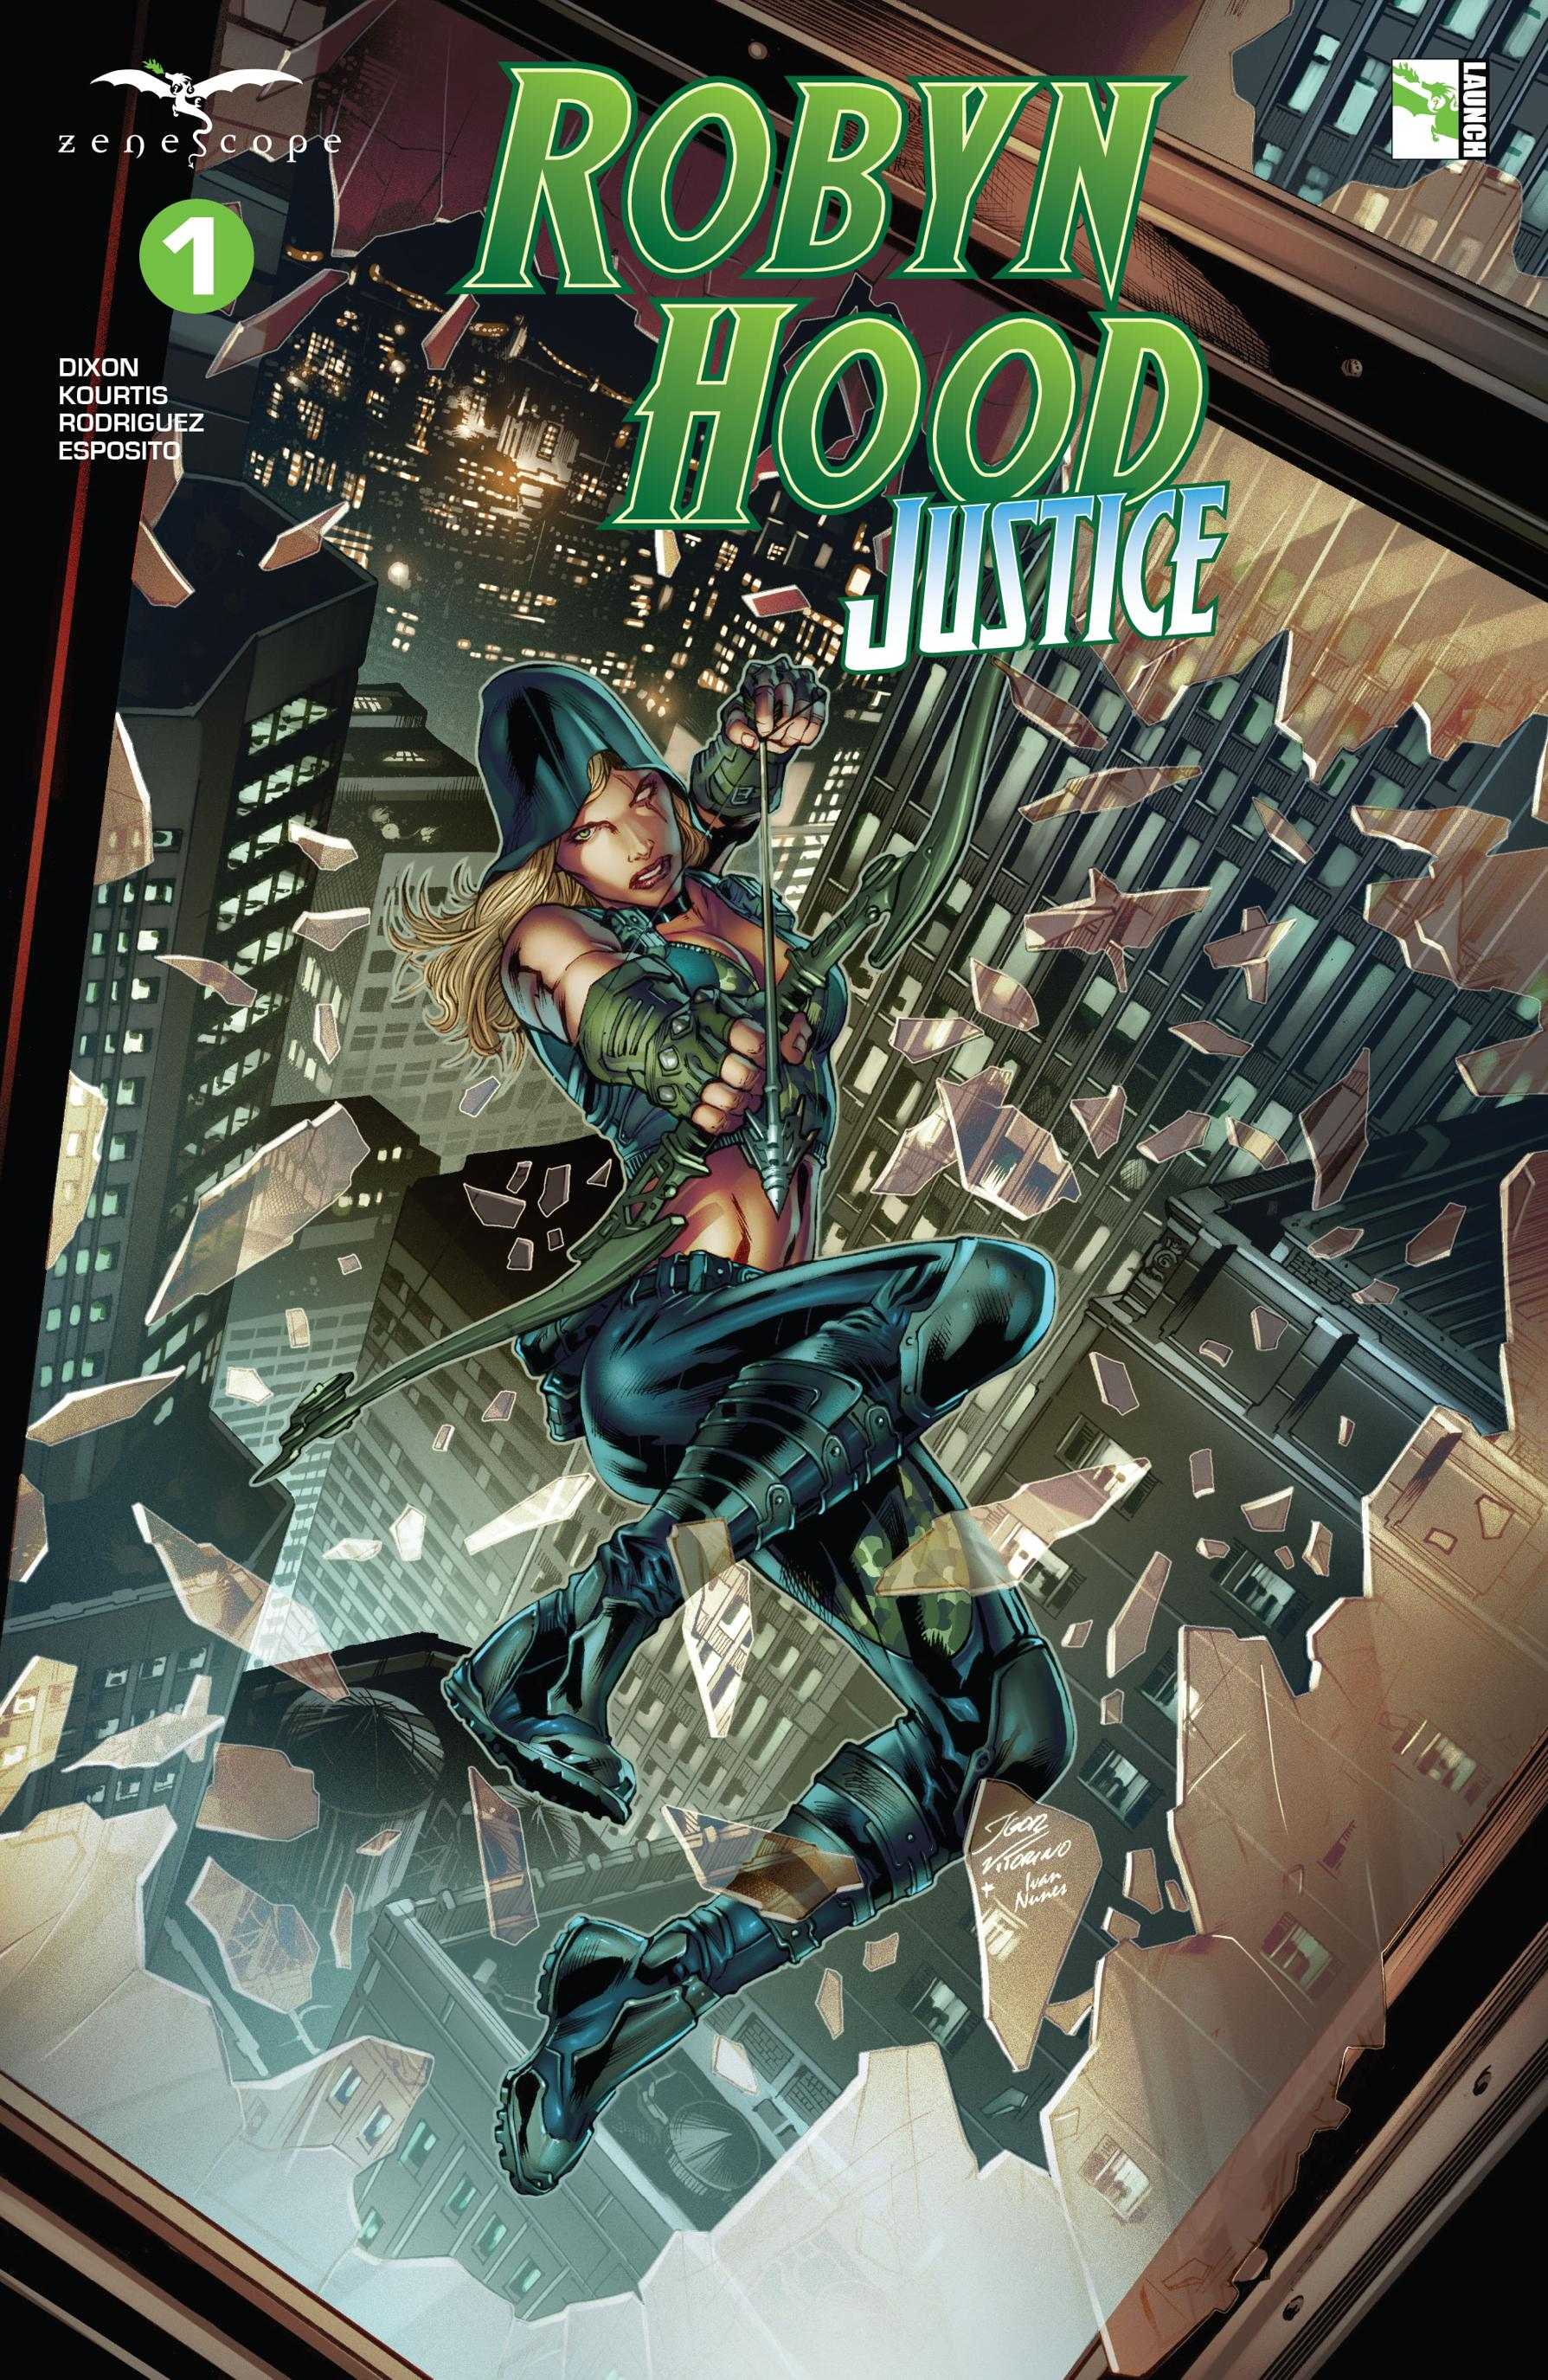 Robyn Hood-Justice 01 of 06 2020 digital The Seeker